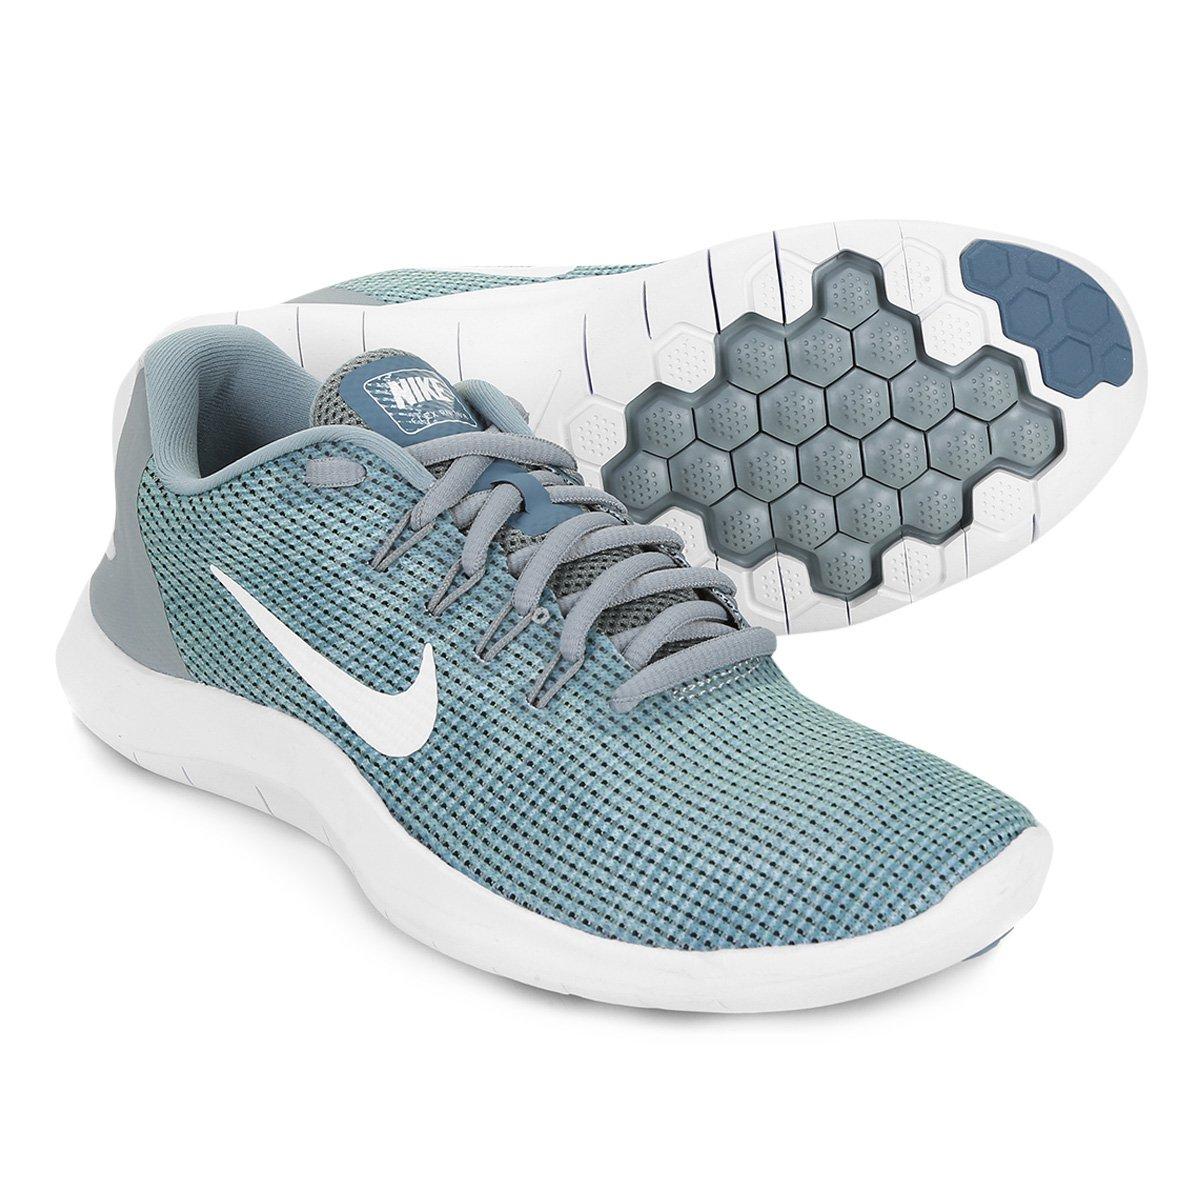 Tênis Nike Wmns Flex 2018 Rn Feminino Verde E Branco